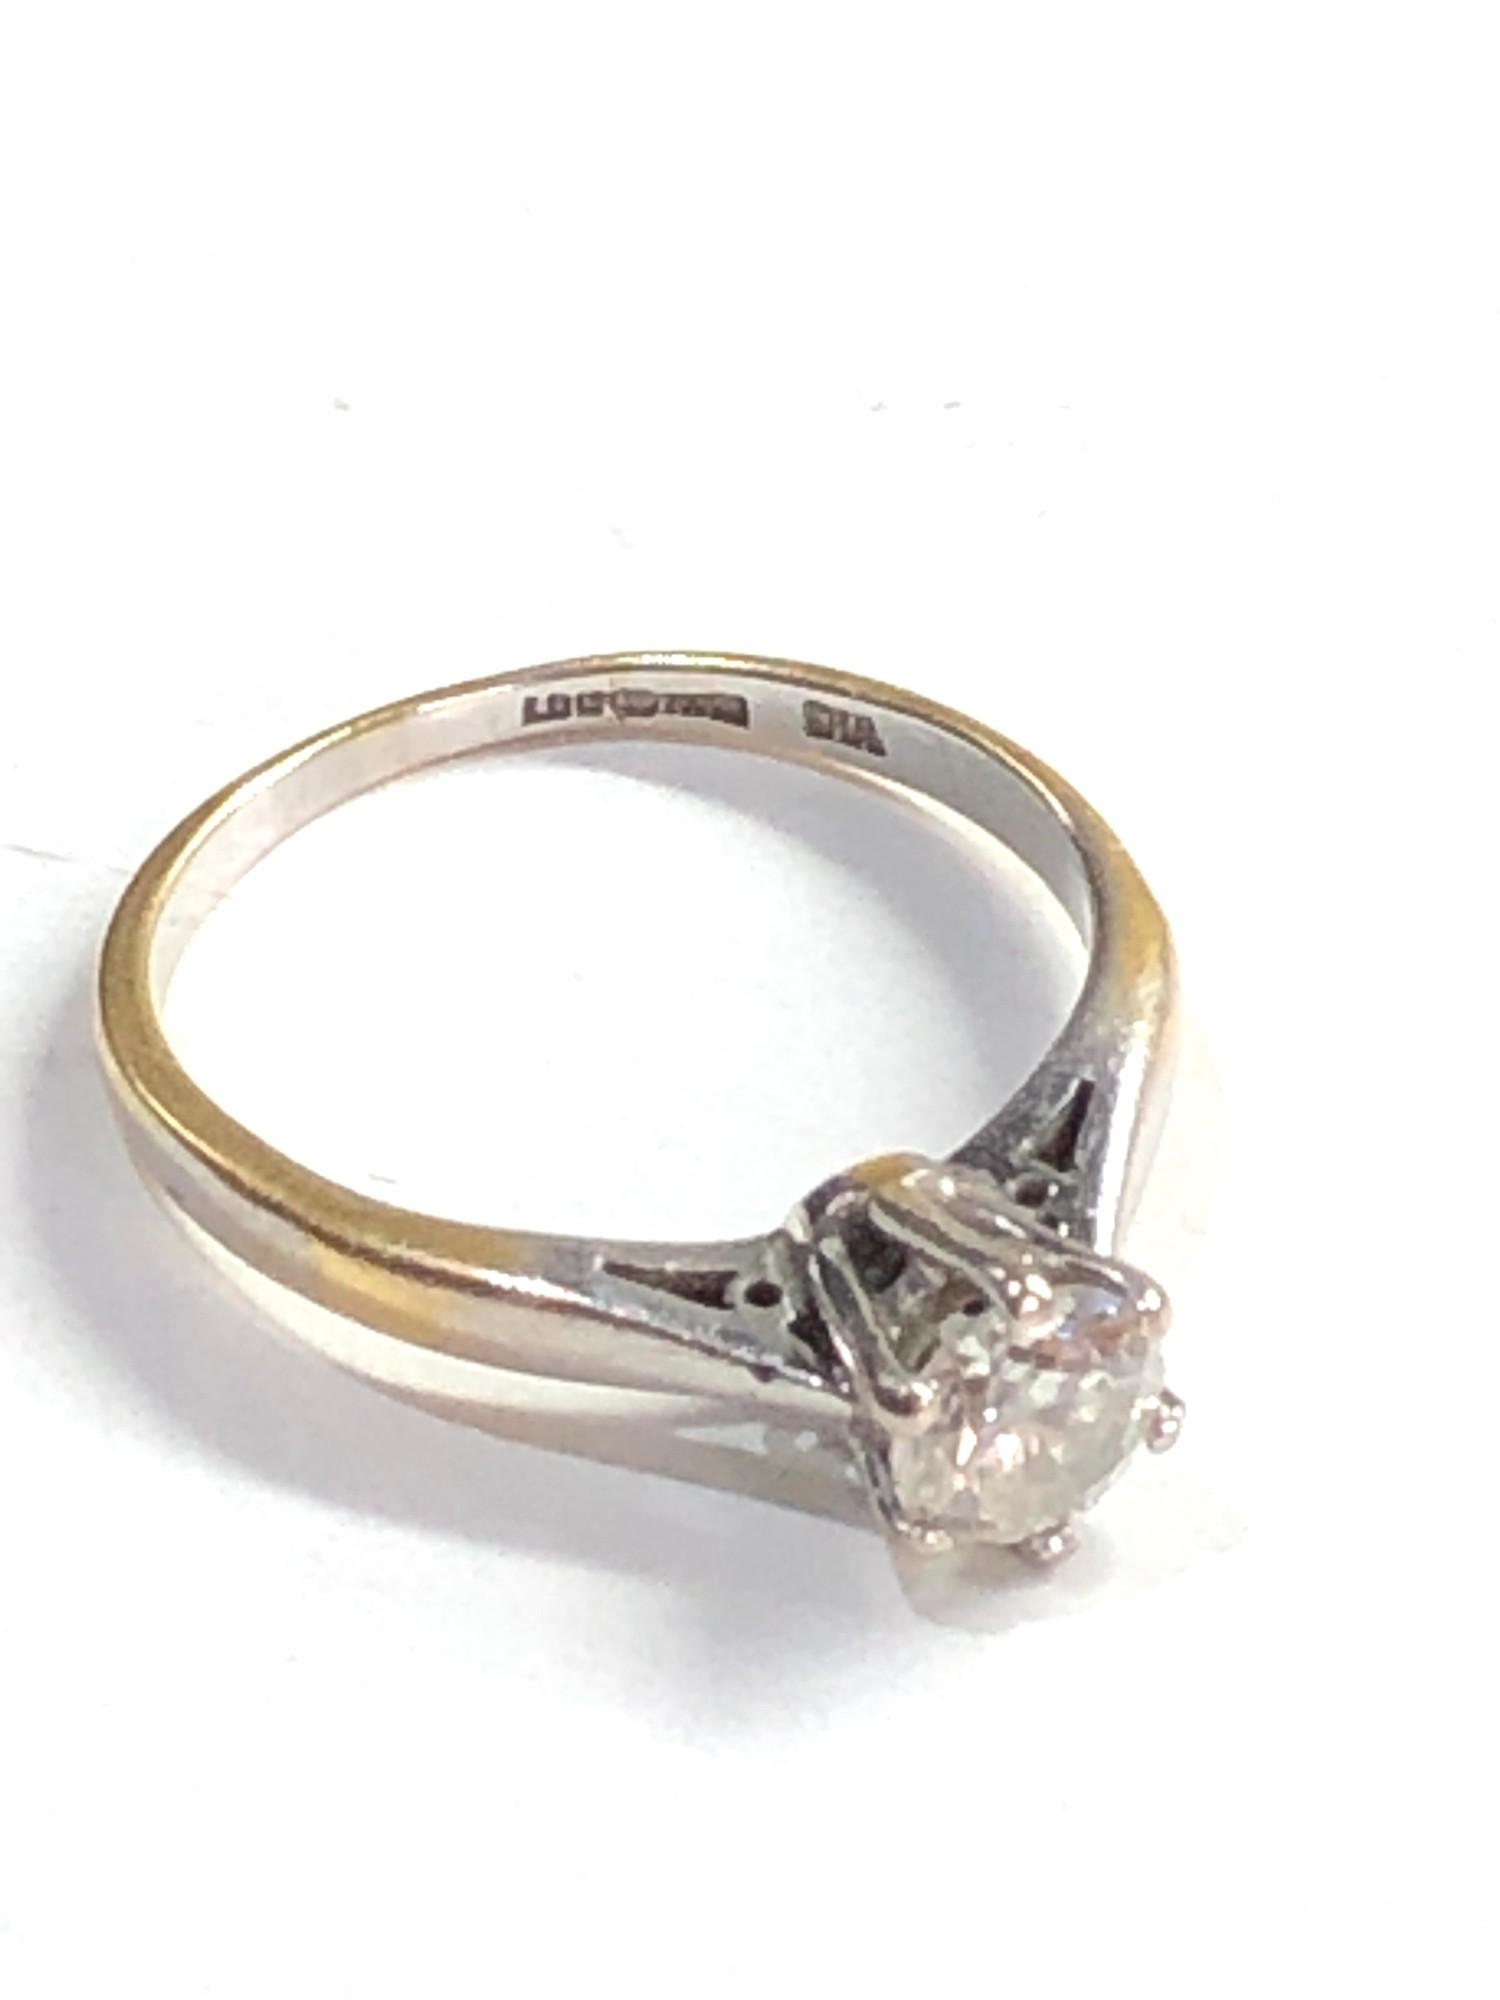 Fine 18ct gold diamond ring 0.50ct - Image 4 of 6